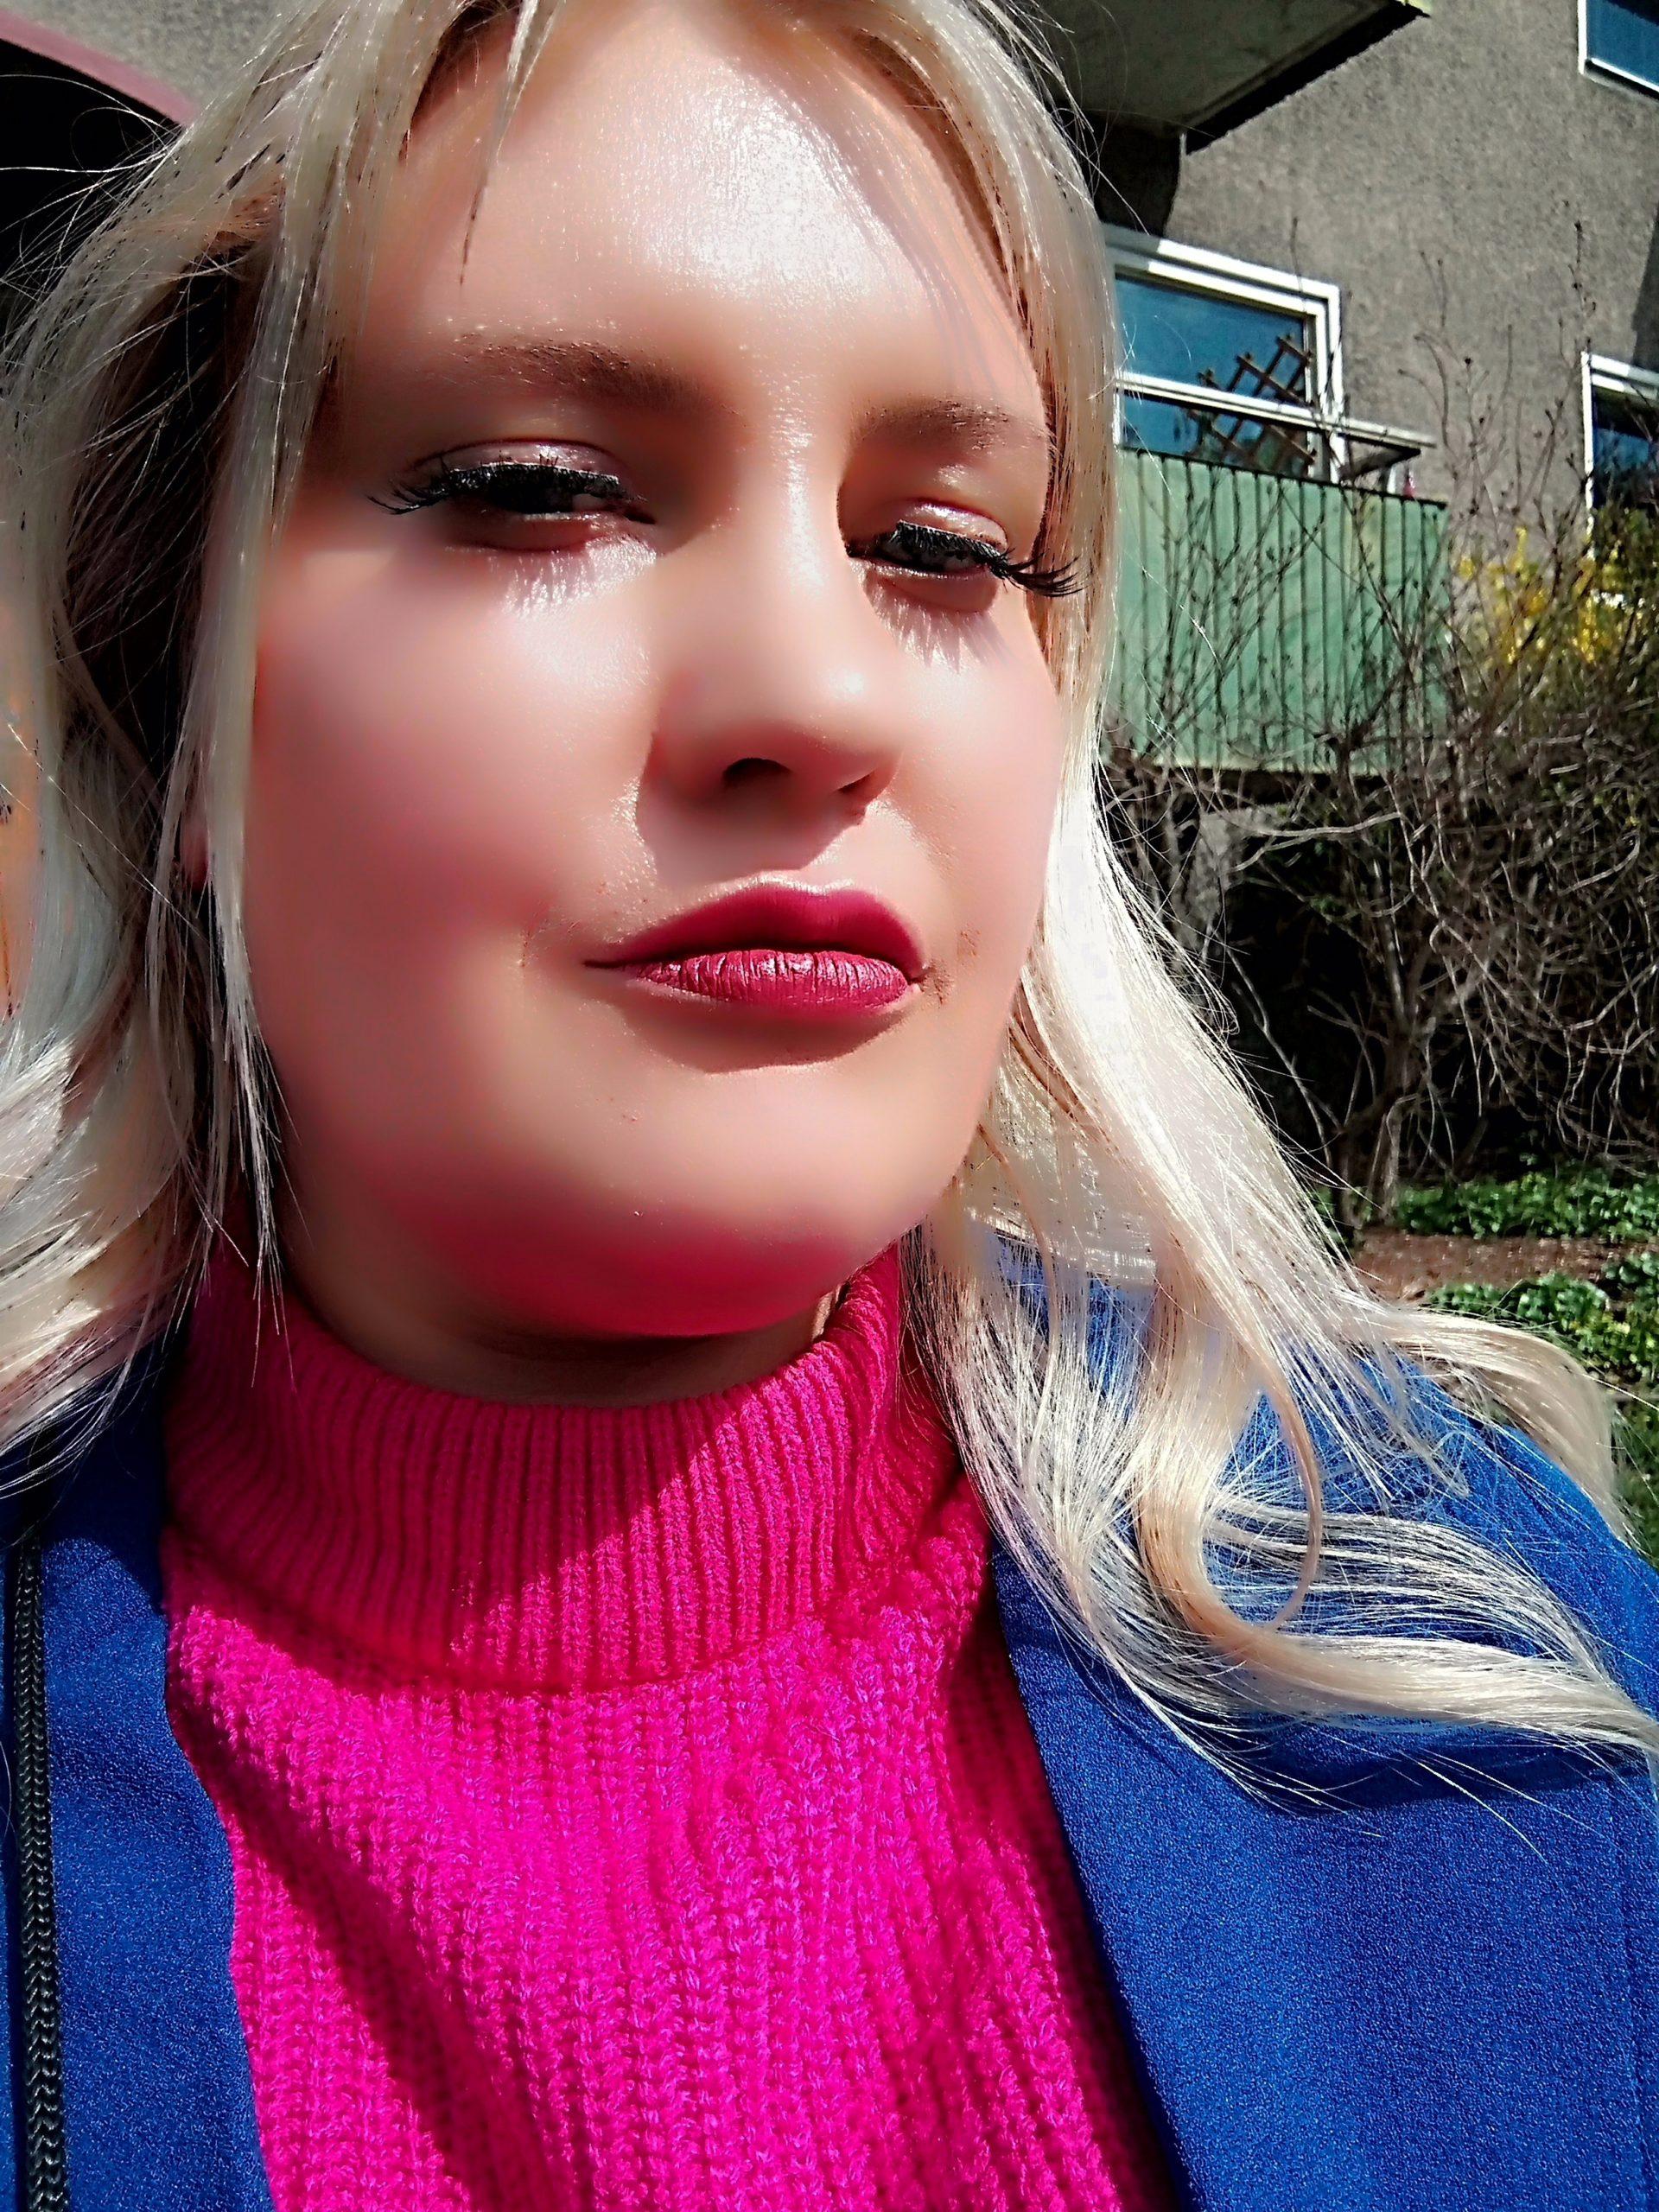 Intervju med Alma Lindé